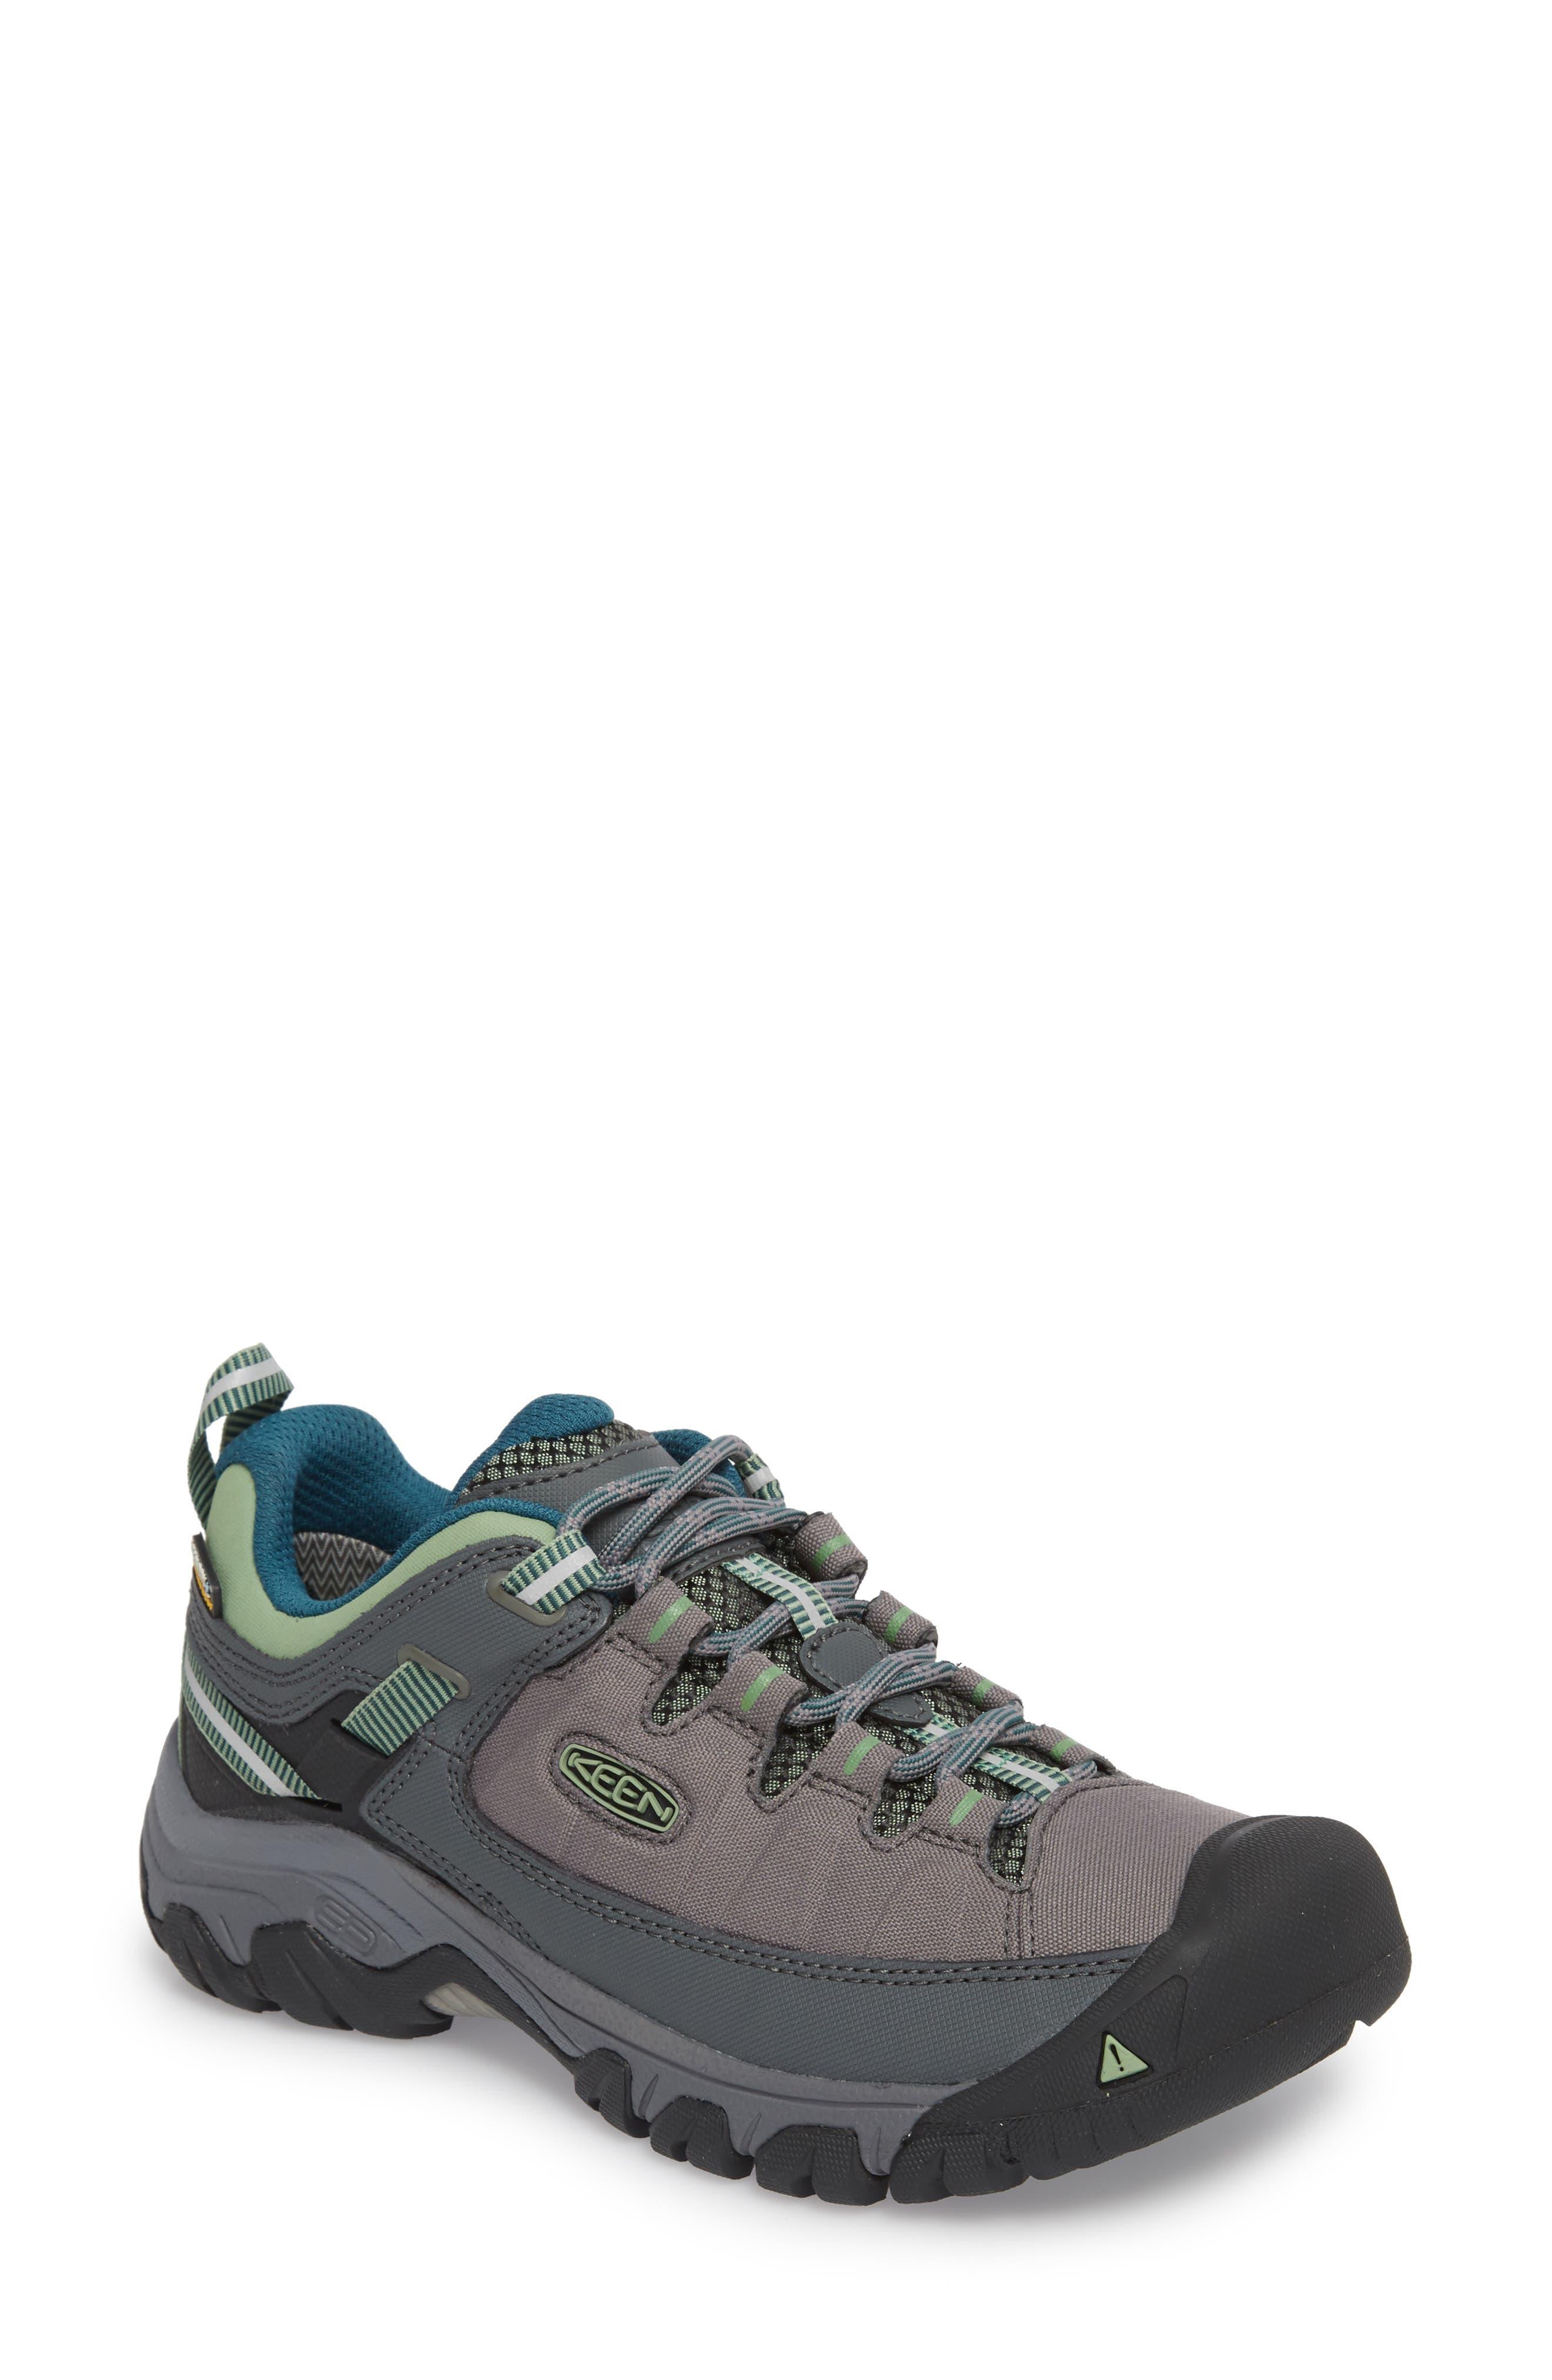 Targhee EXP Waterproof Hiking Shoe,                             Main thumbnail 1, color,                             STEEL GREY/ BASIL